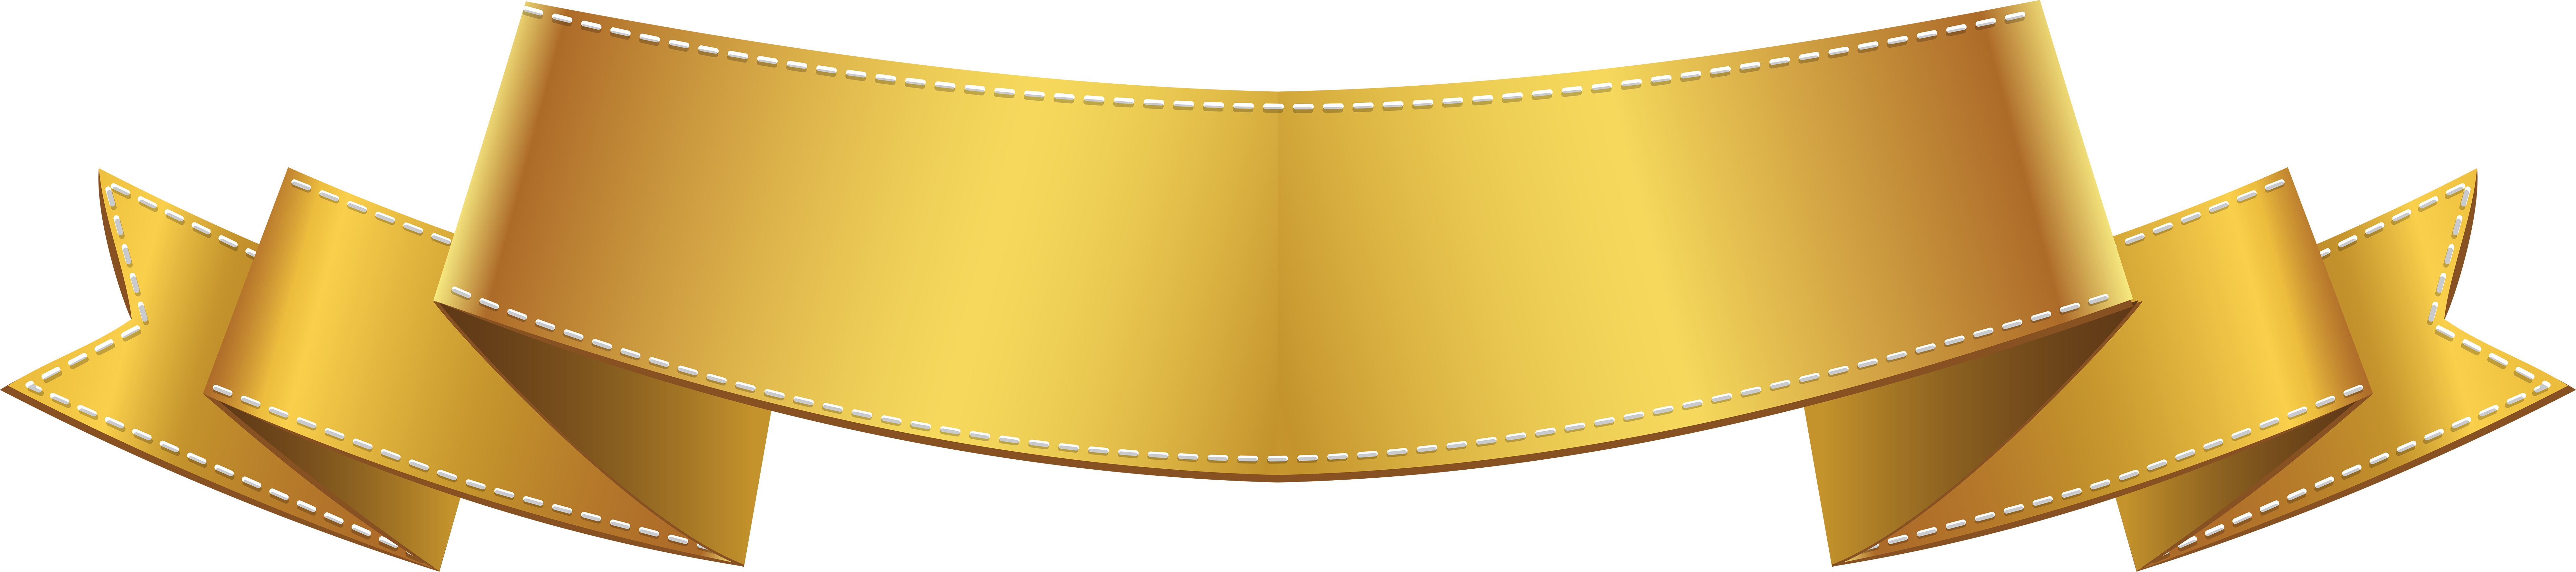 Clipart png banner. Golden clip art image